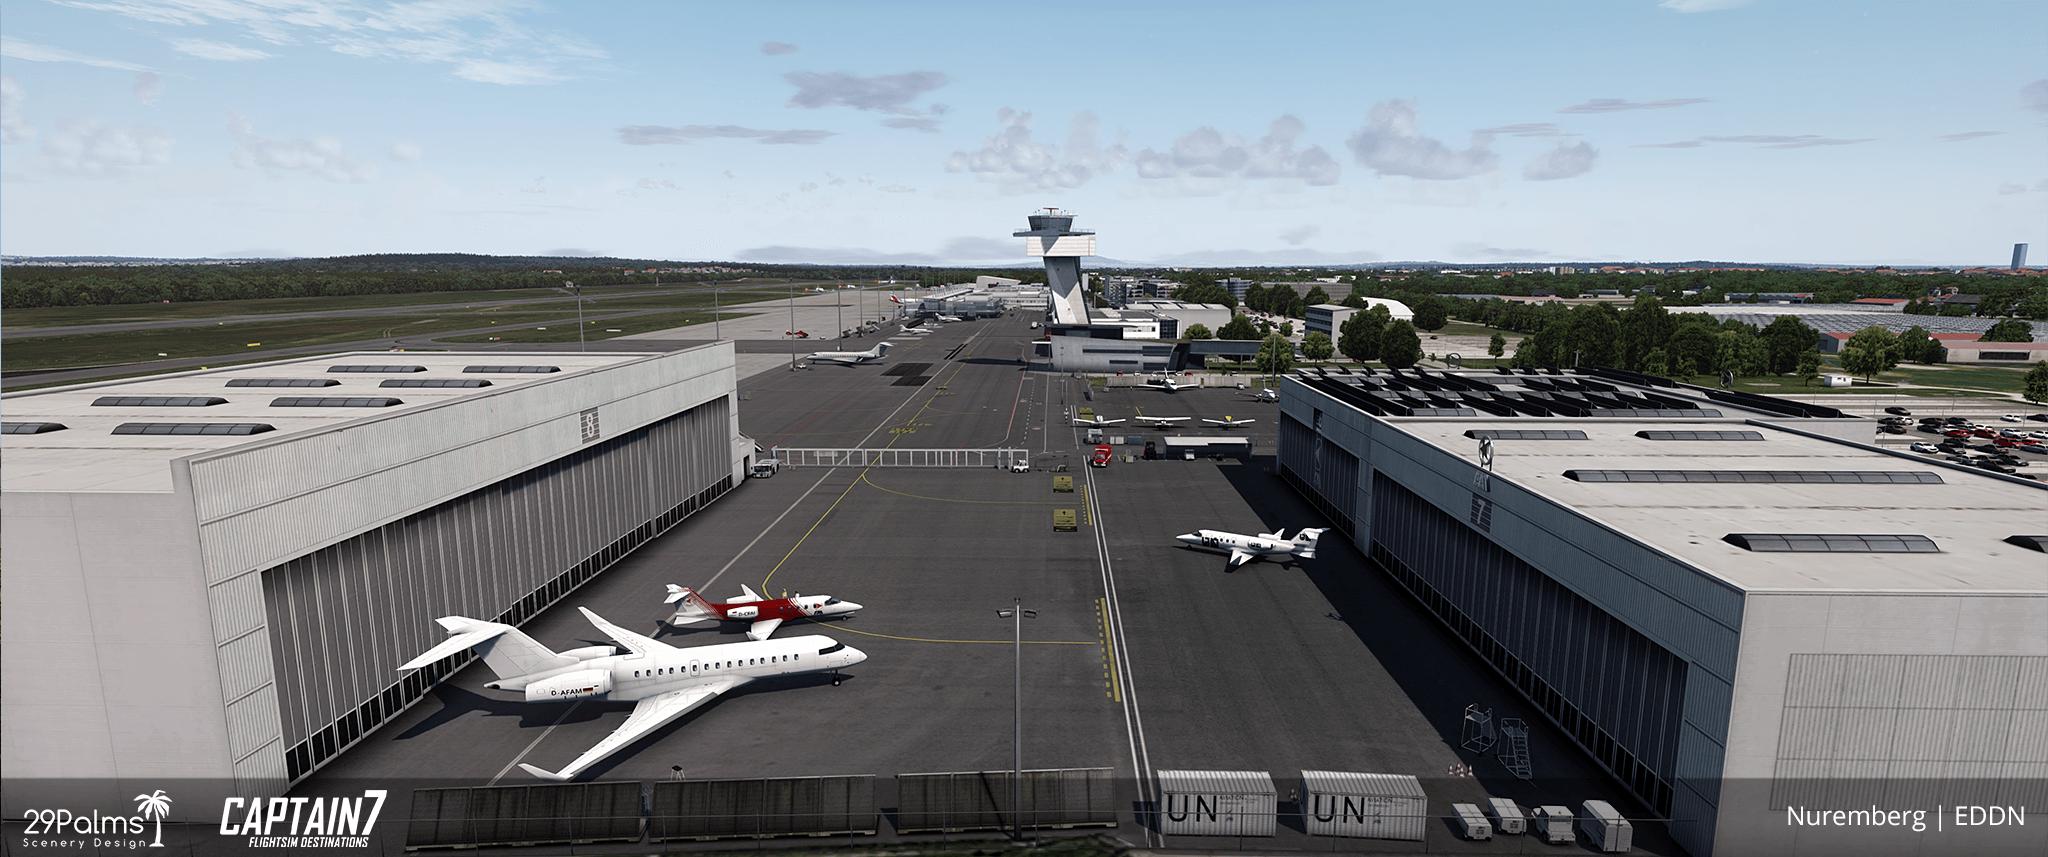 EDDN Albrecht Dürer Airport Nuremberg Scenery Addon for P3D   Captain7